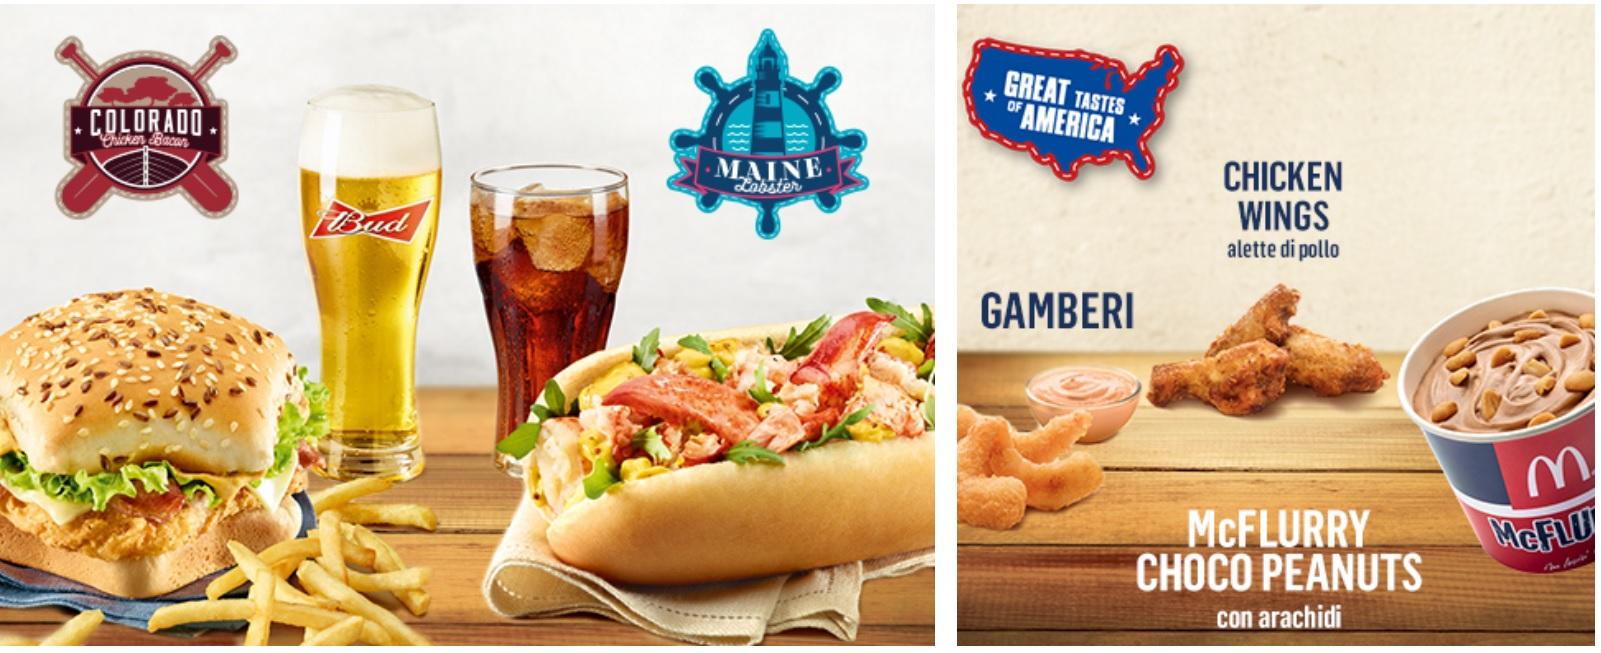 McDonald's Maine Lobster